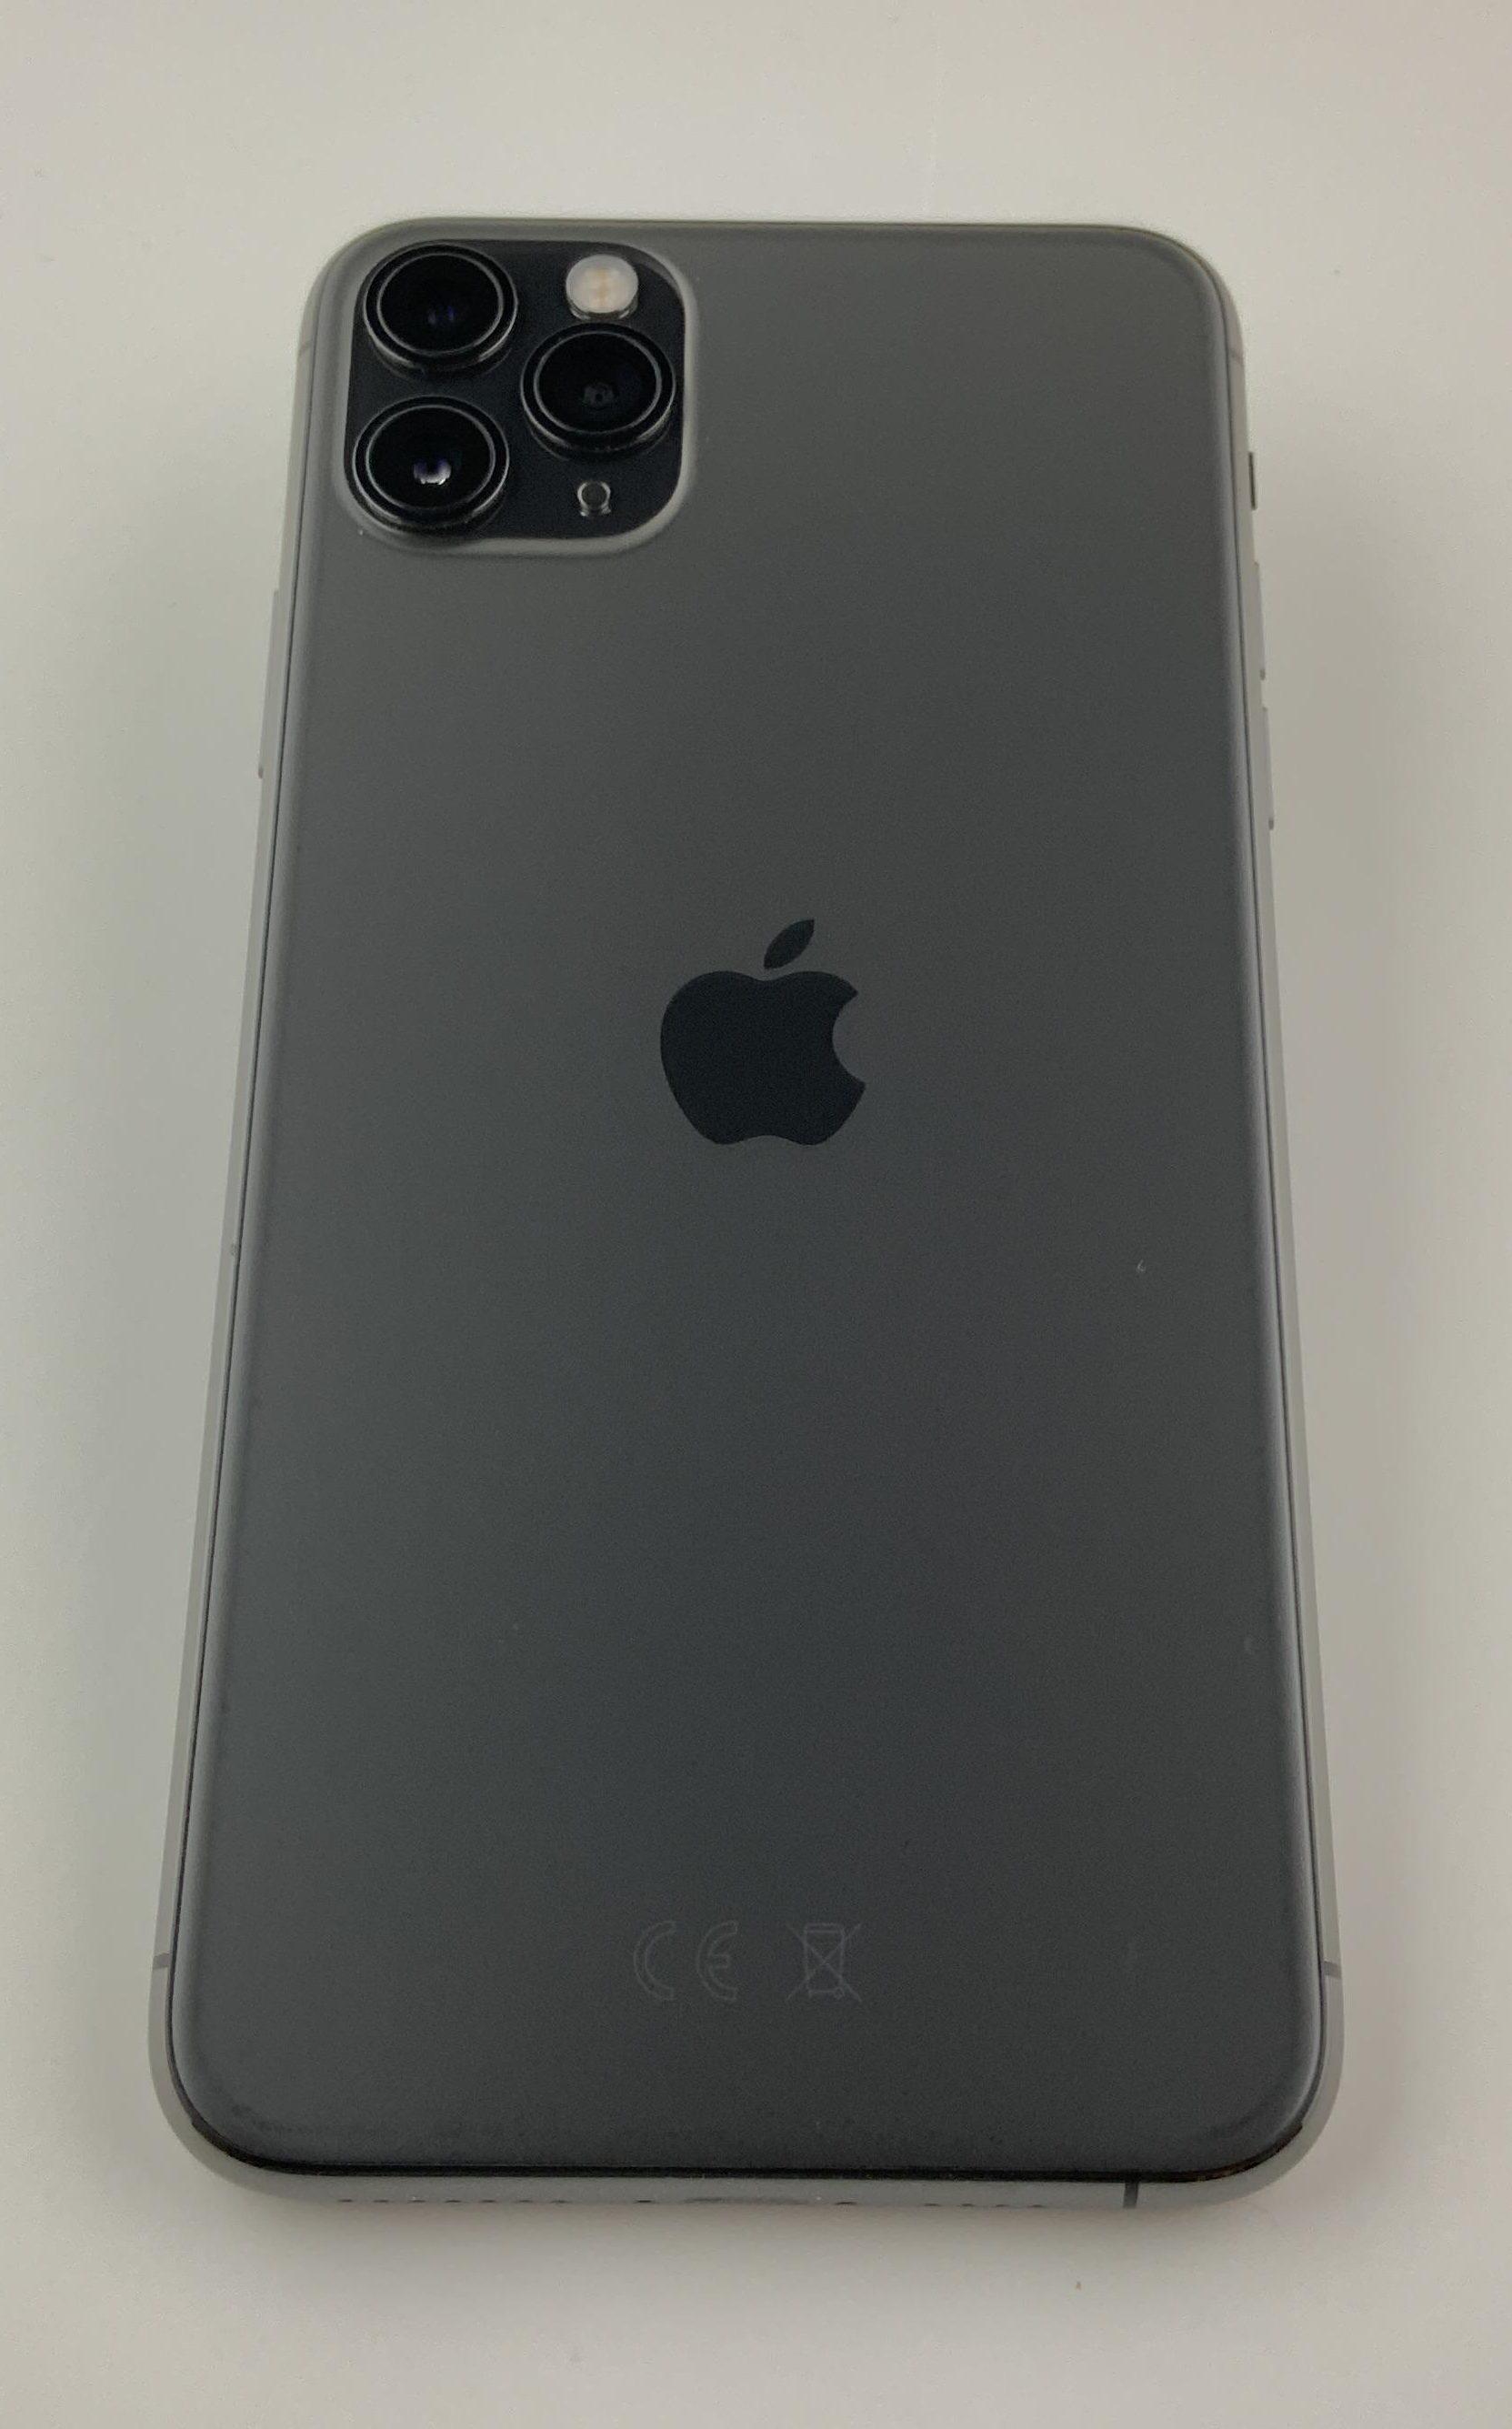 iPhone 11 Pro Max 256GB, 256GB, Space Gray, image 2